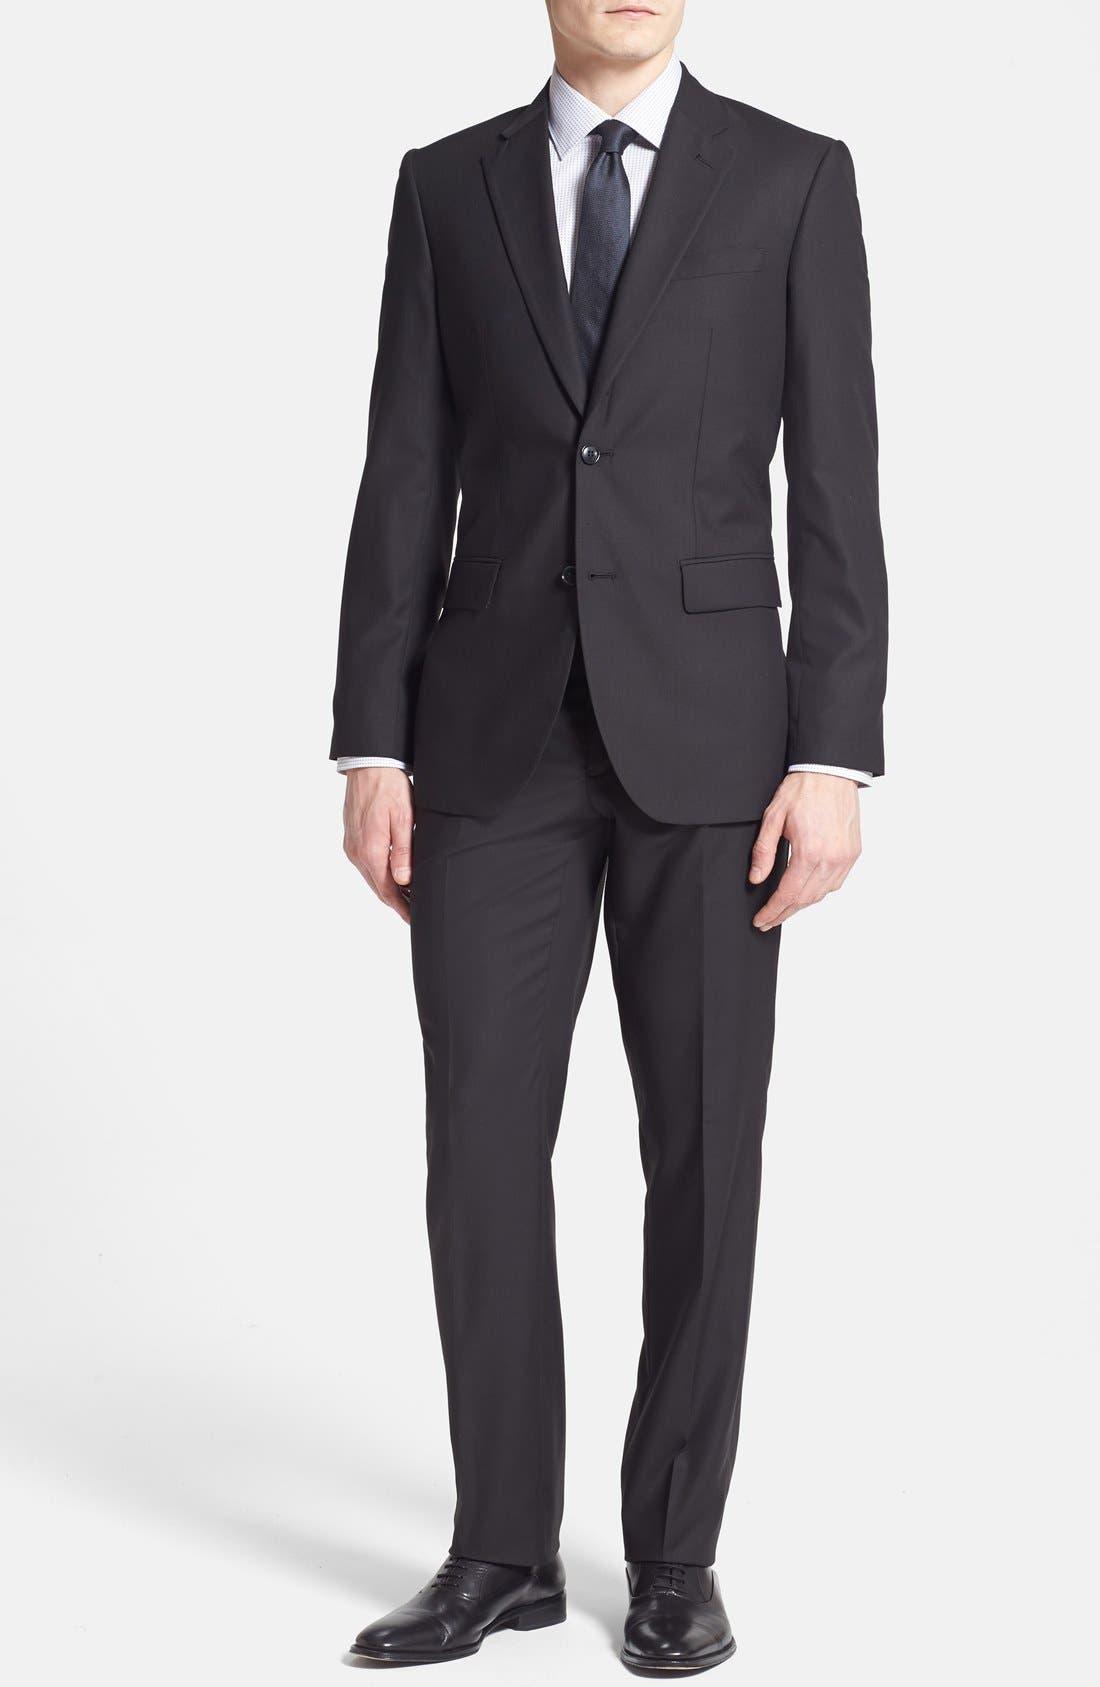 Main Image - Rockin' Sartorial Trim Fit Wrinkle Resistant Travel Suit